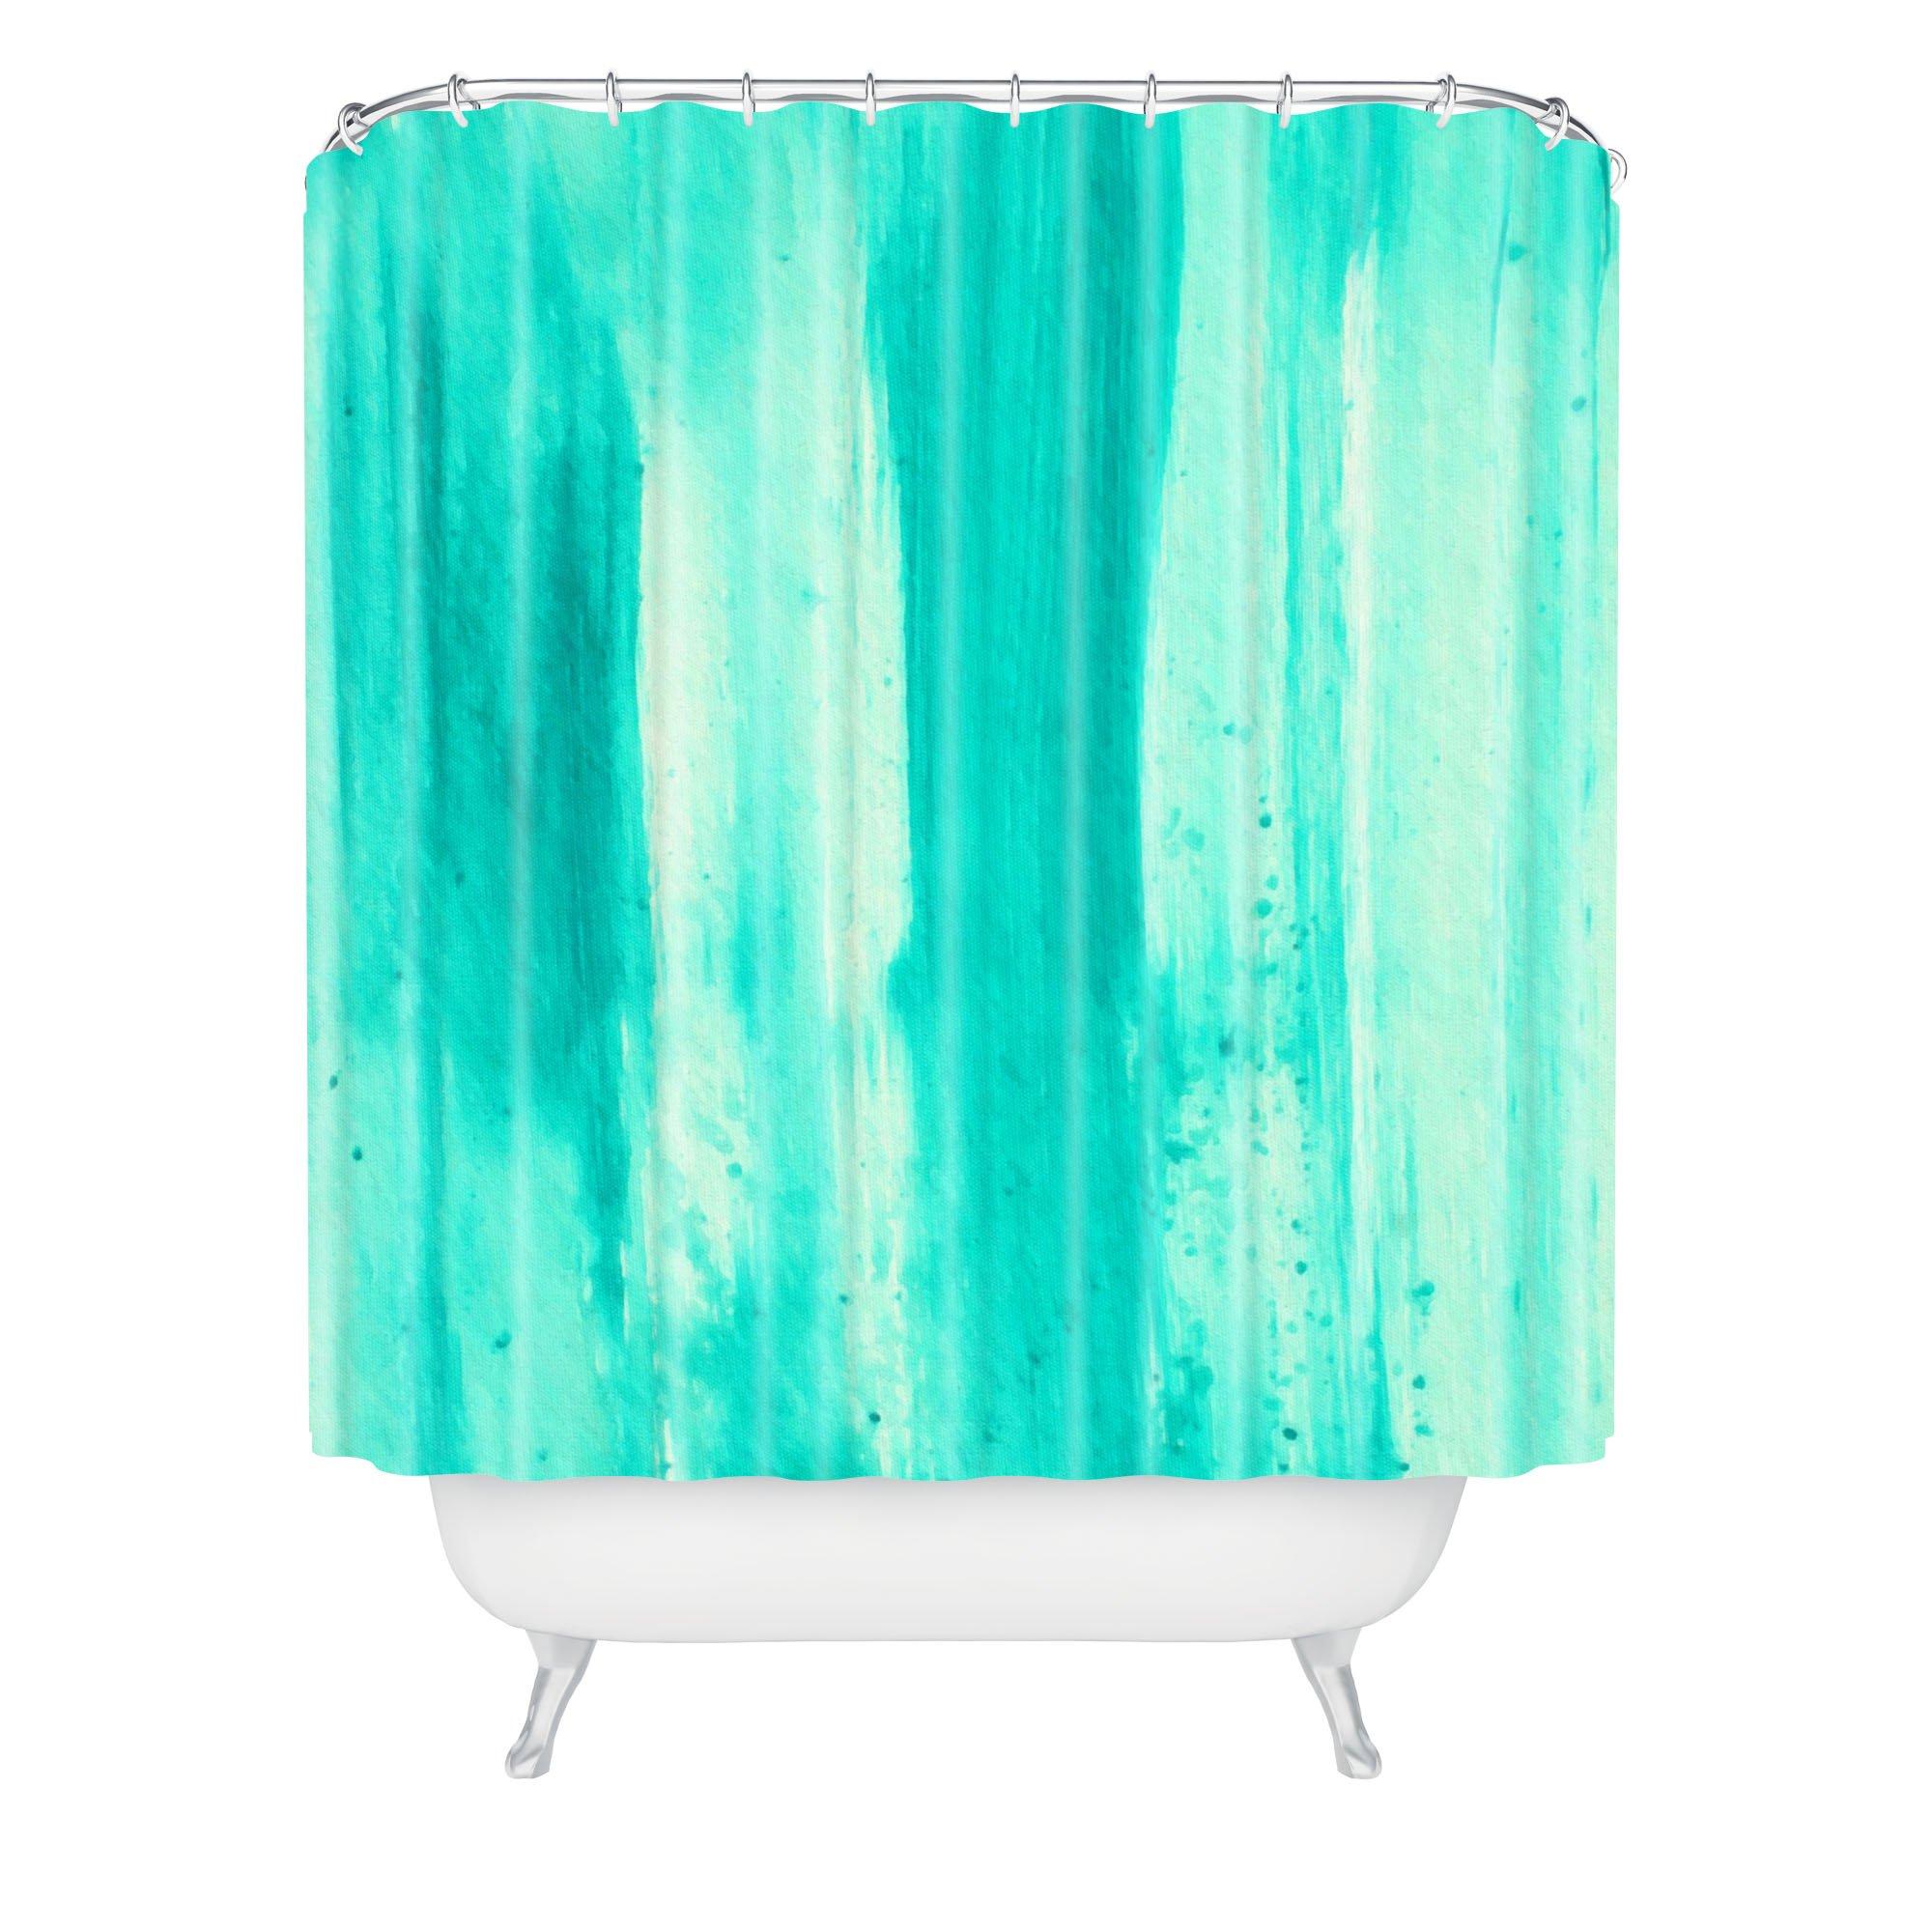 Deny Designs Madart Inc. Modern Dance Aqua Passion Shower Curtain, 69'' x 72''